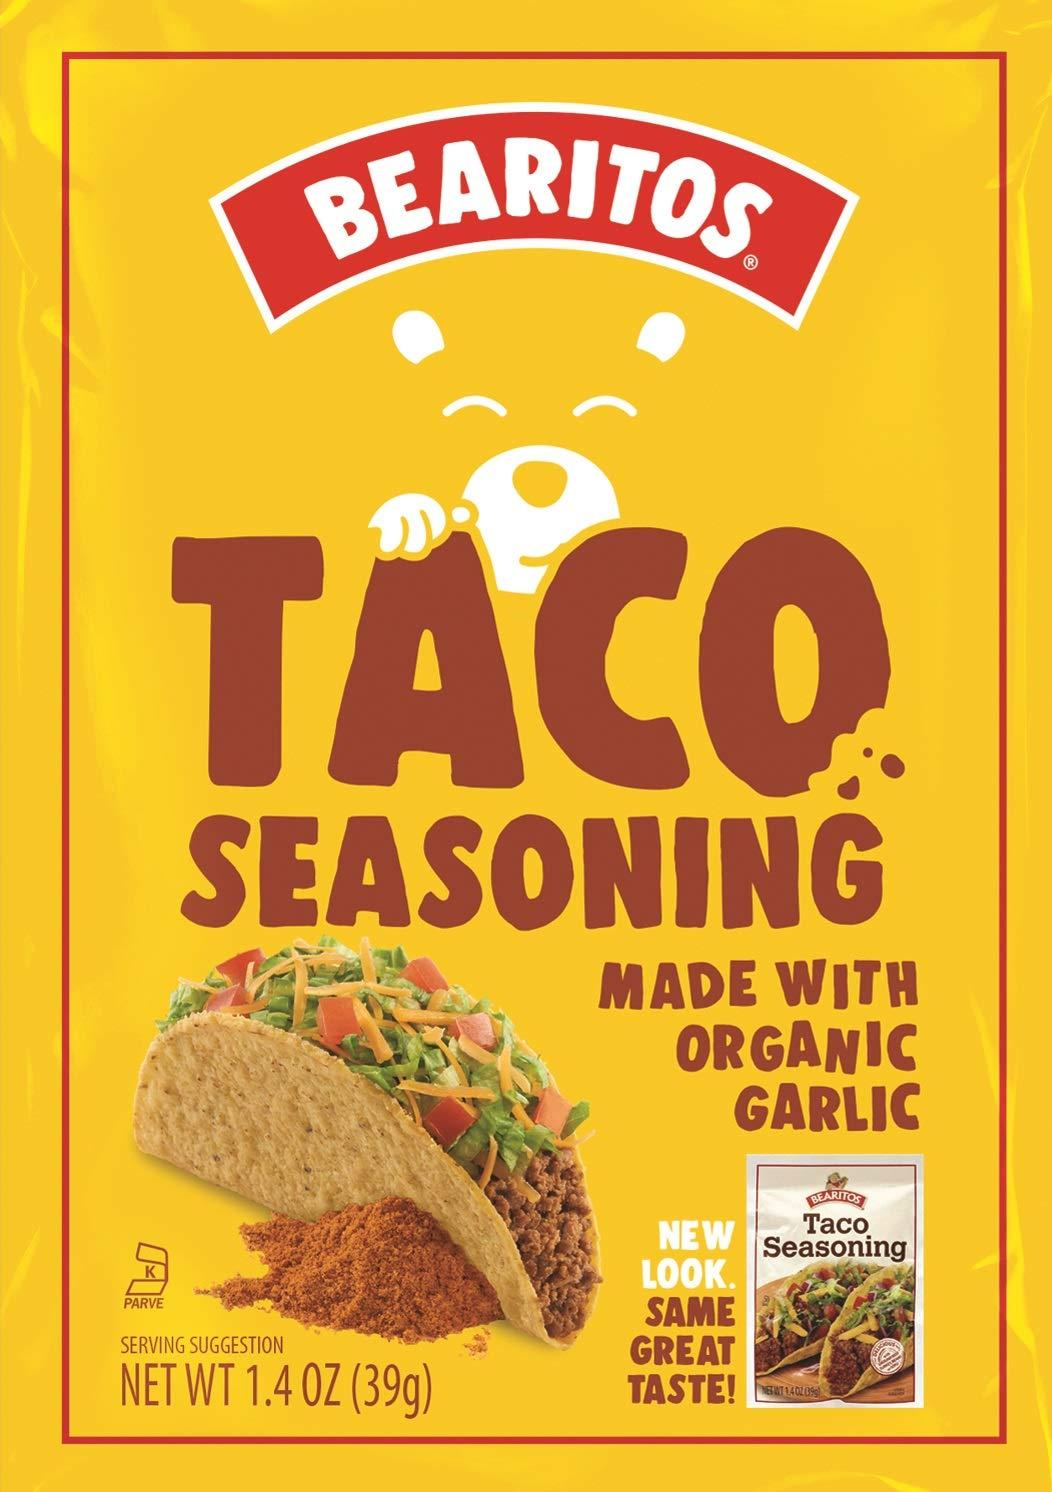 Bearitos Taco Seasoning Ranking TOP5 1.4 of 12 Oz Pack Alternative dealer